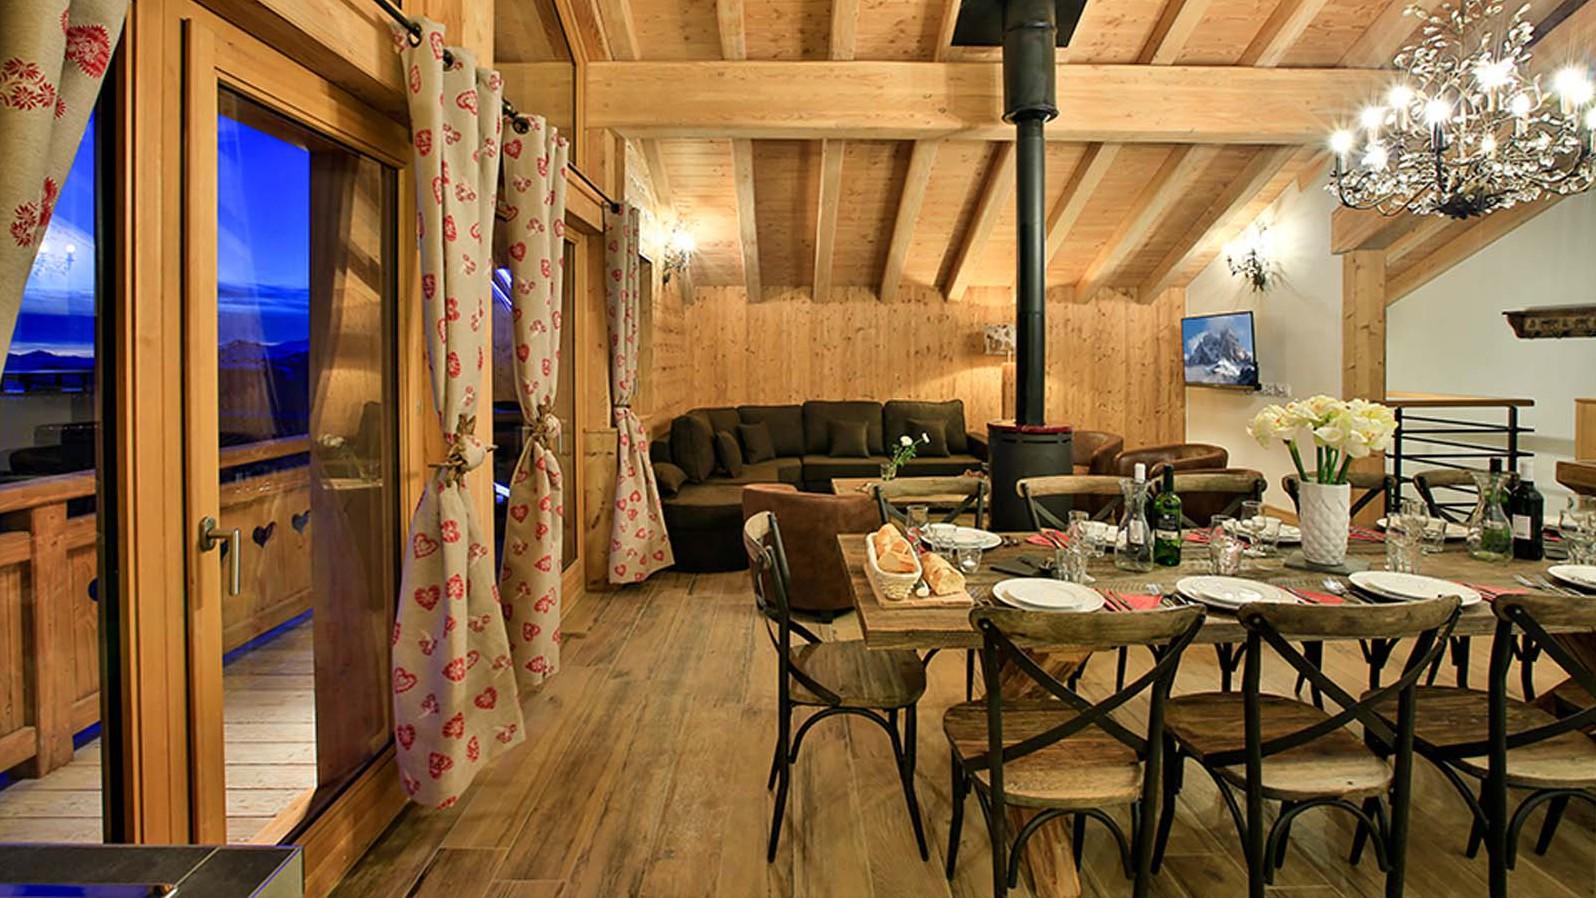 Dining Lounge - Chalet Hepatica - Ski Chalet in La Plagne, France